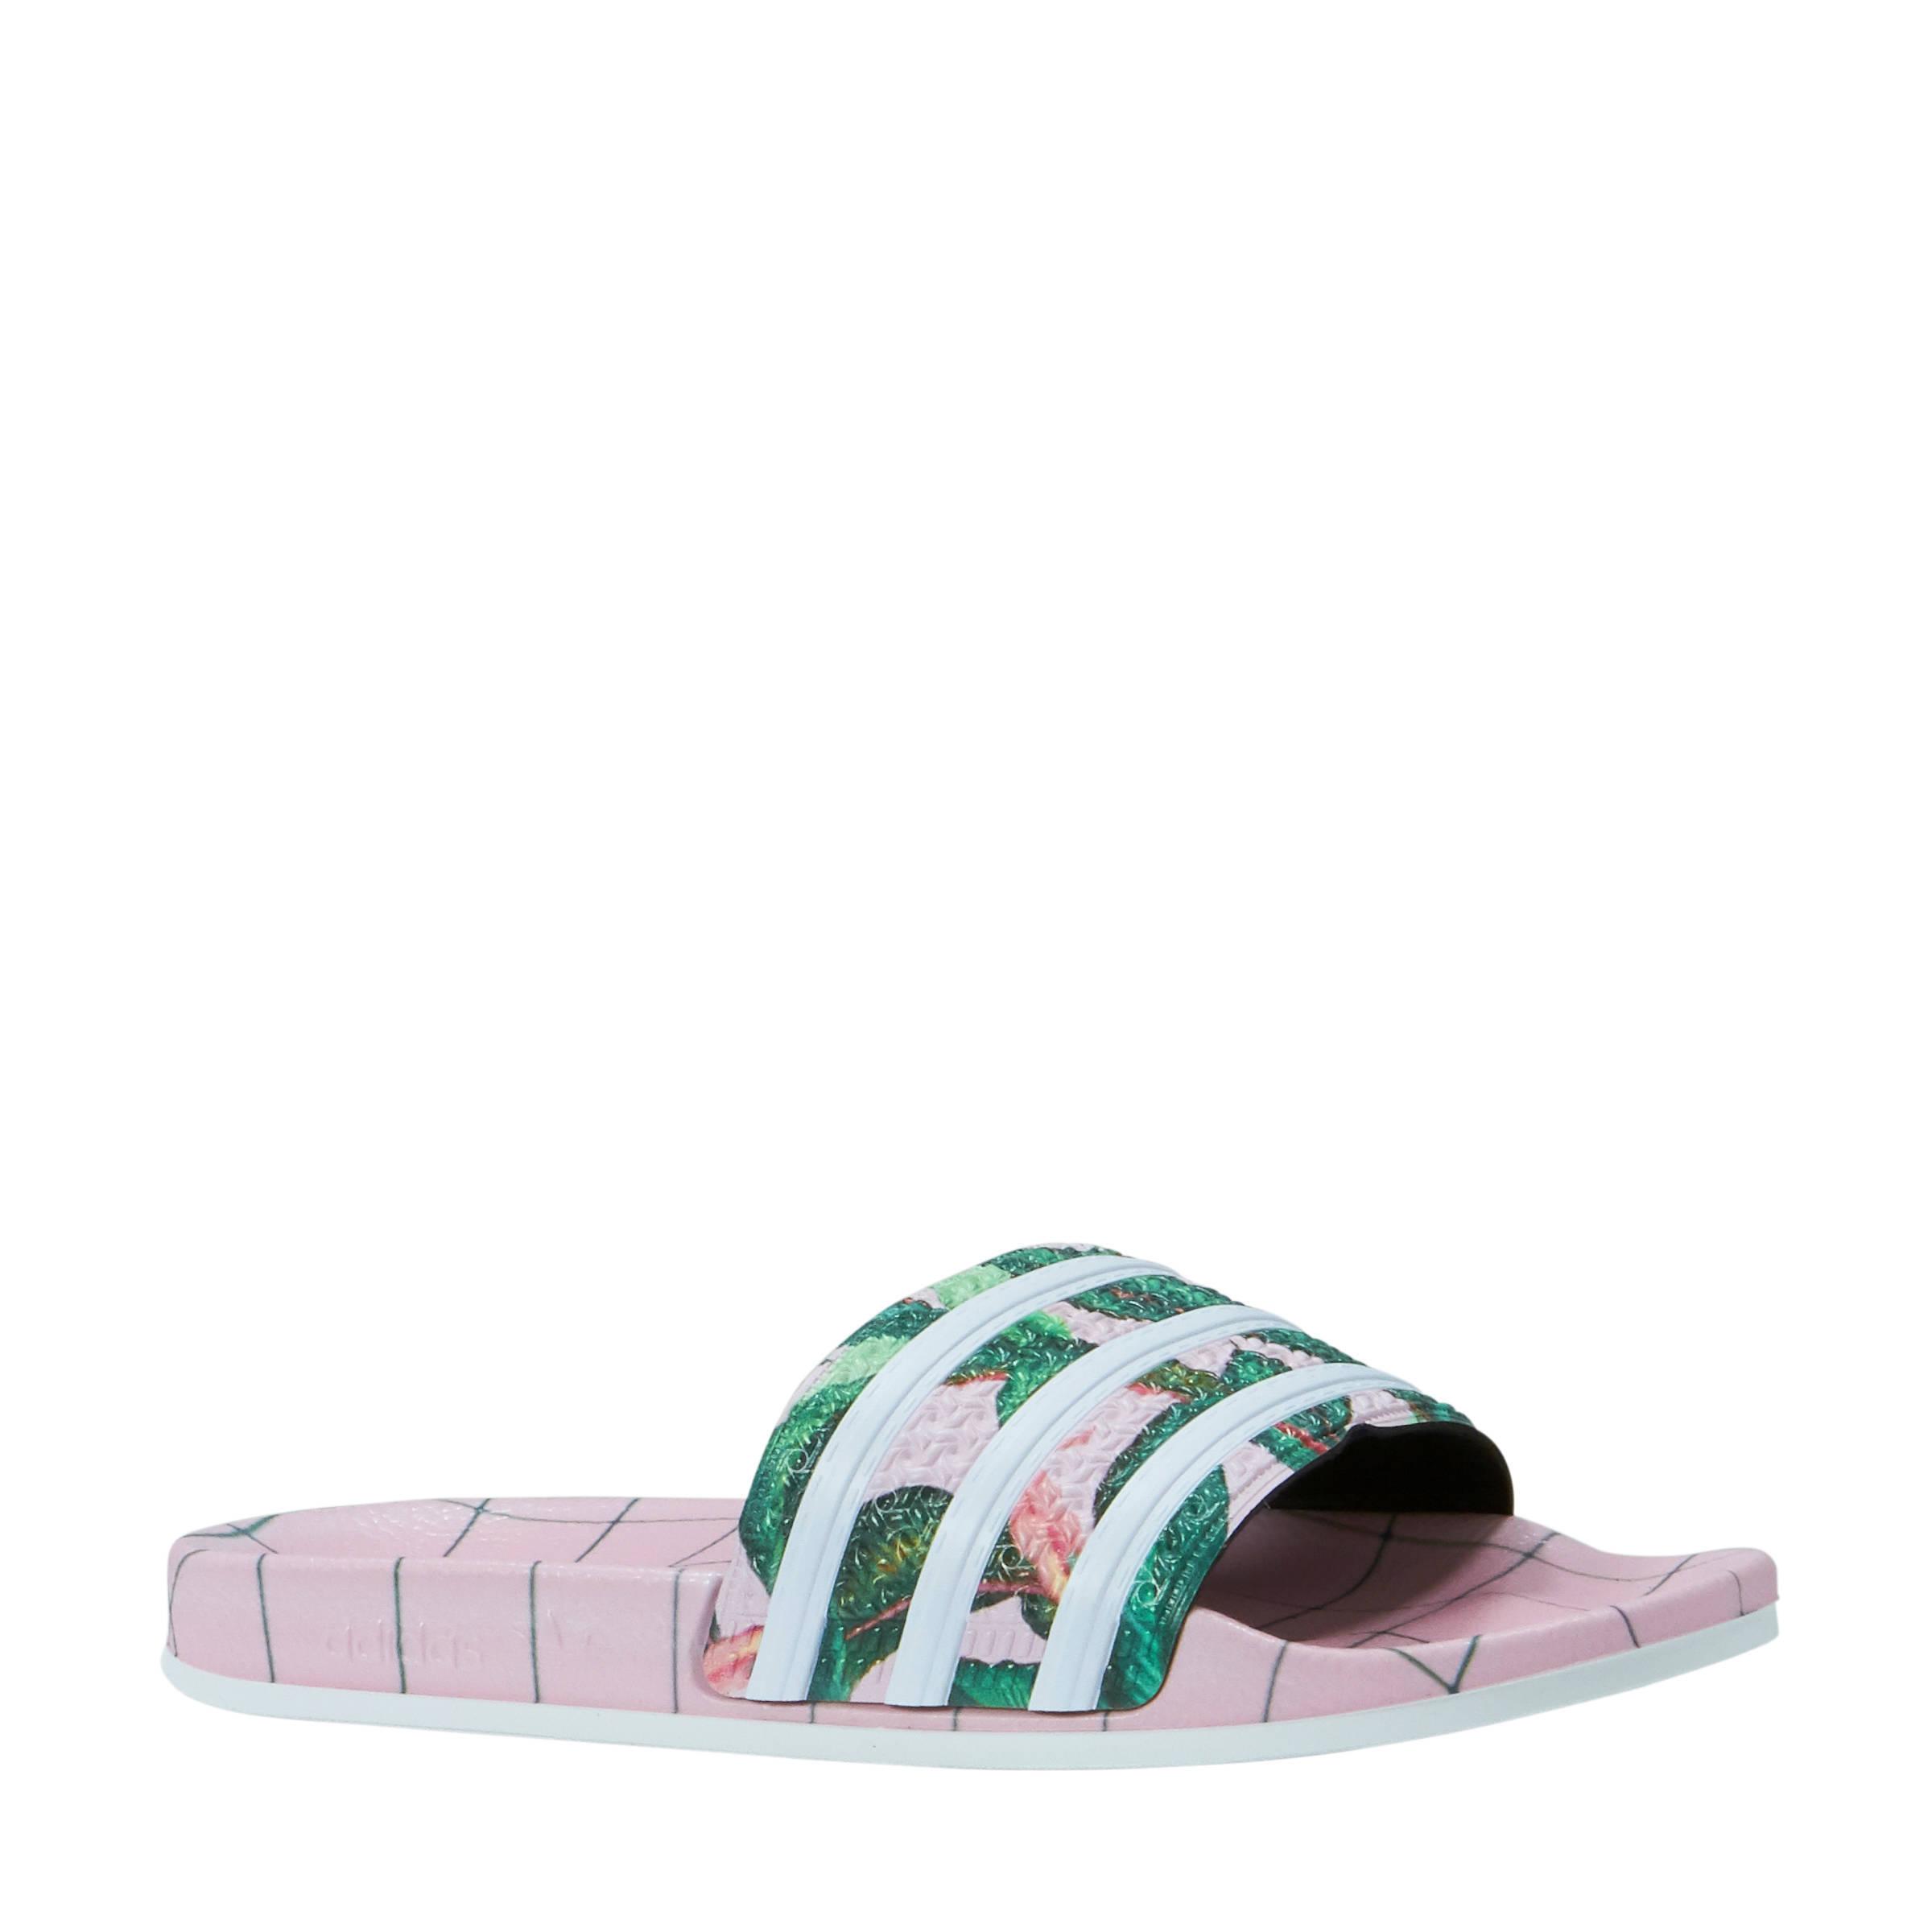 adidas originals Adilette W badslippers | wehkamp